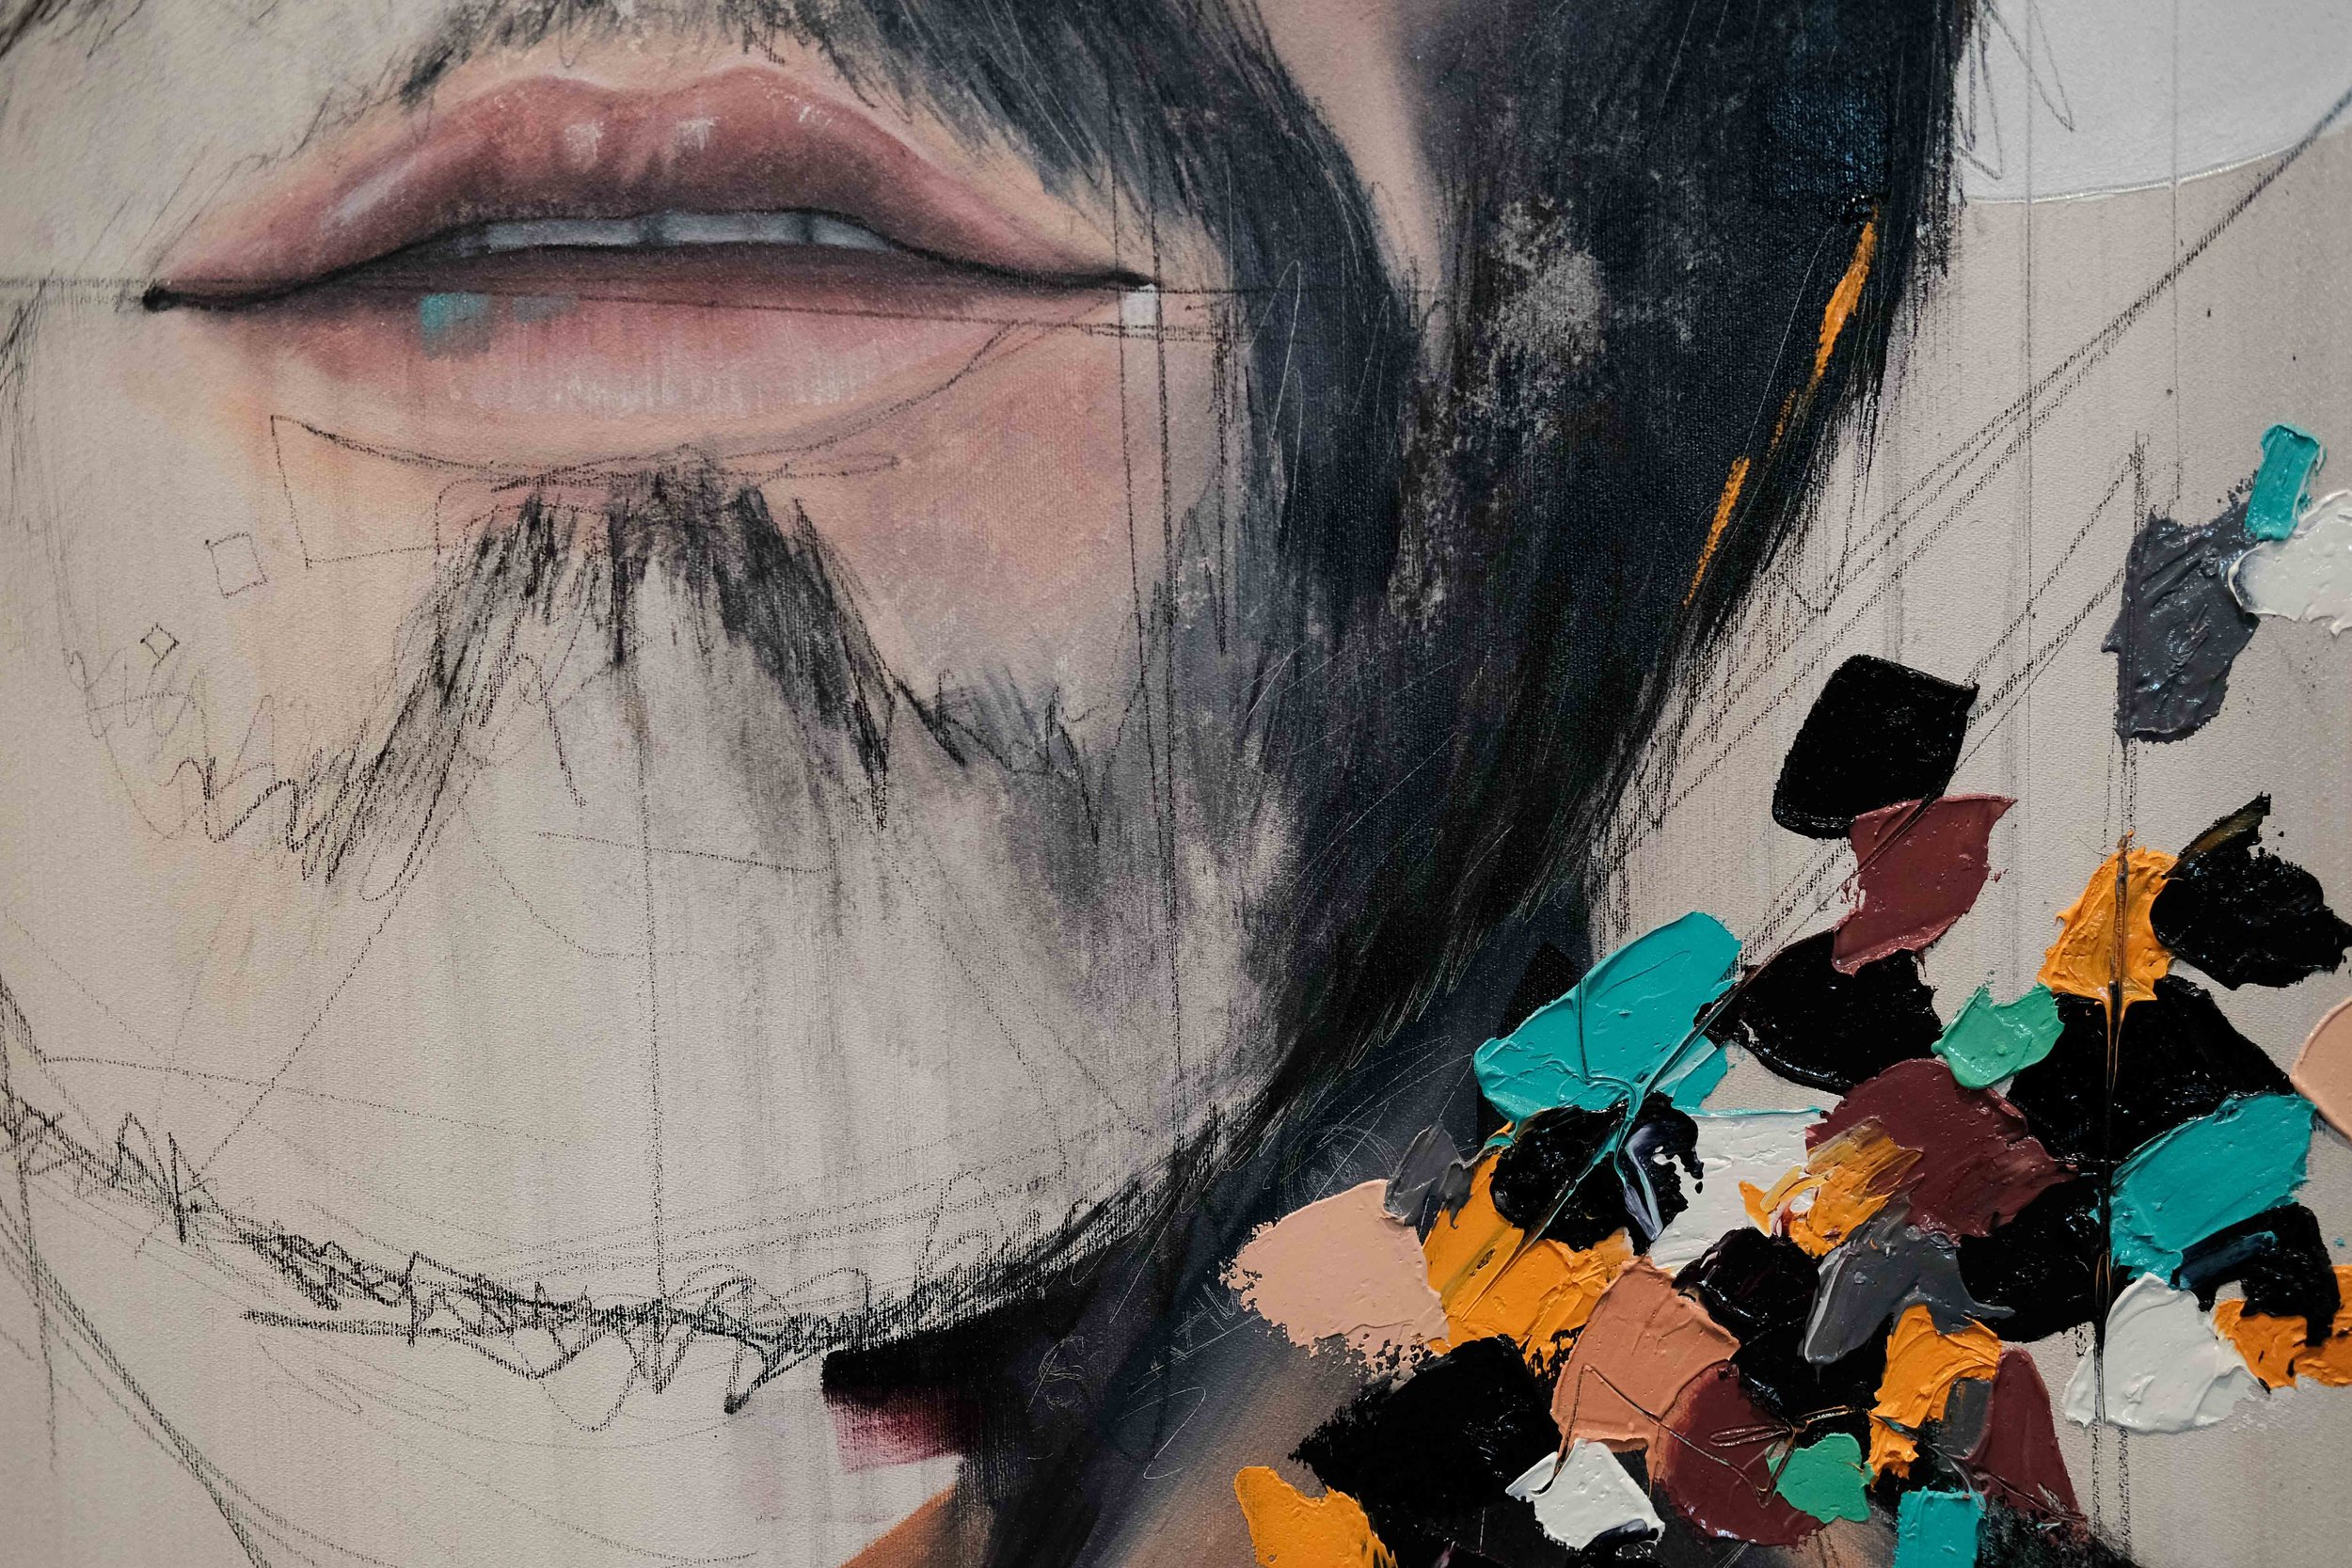 artfair-wearecity-2016-simonhariman-atheneadiapoulis-145.jpg